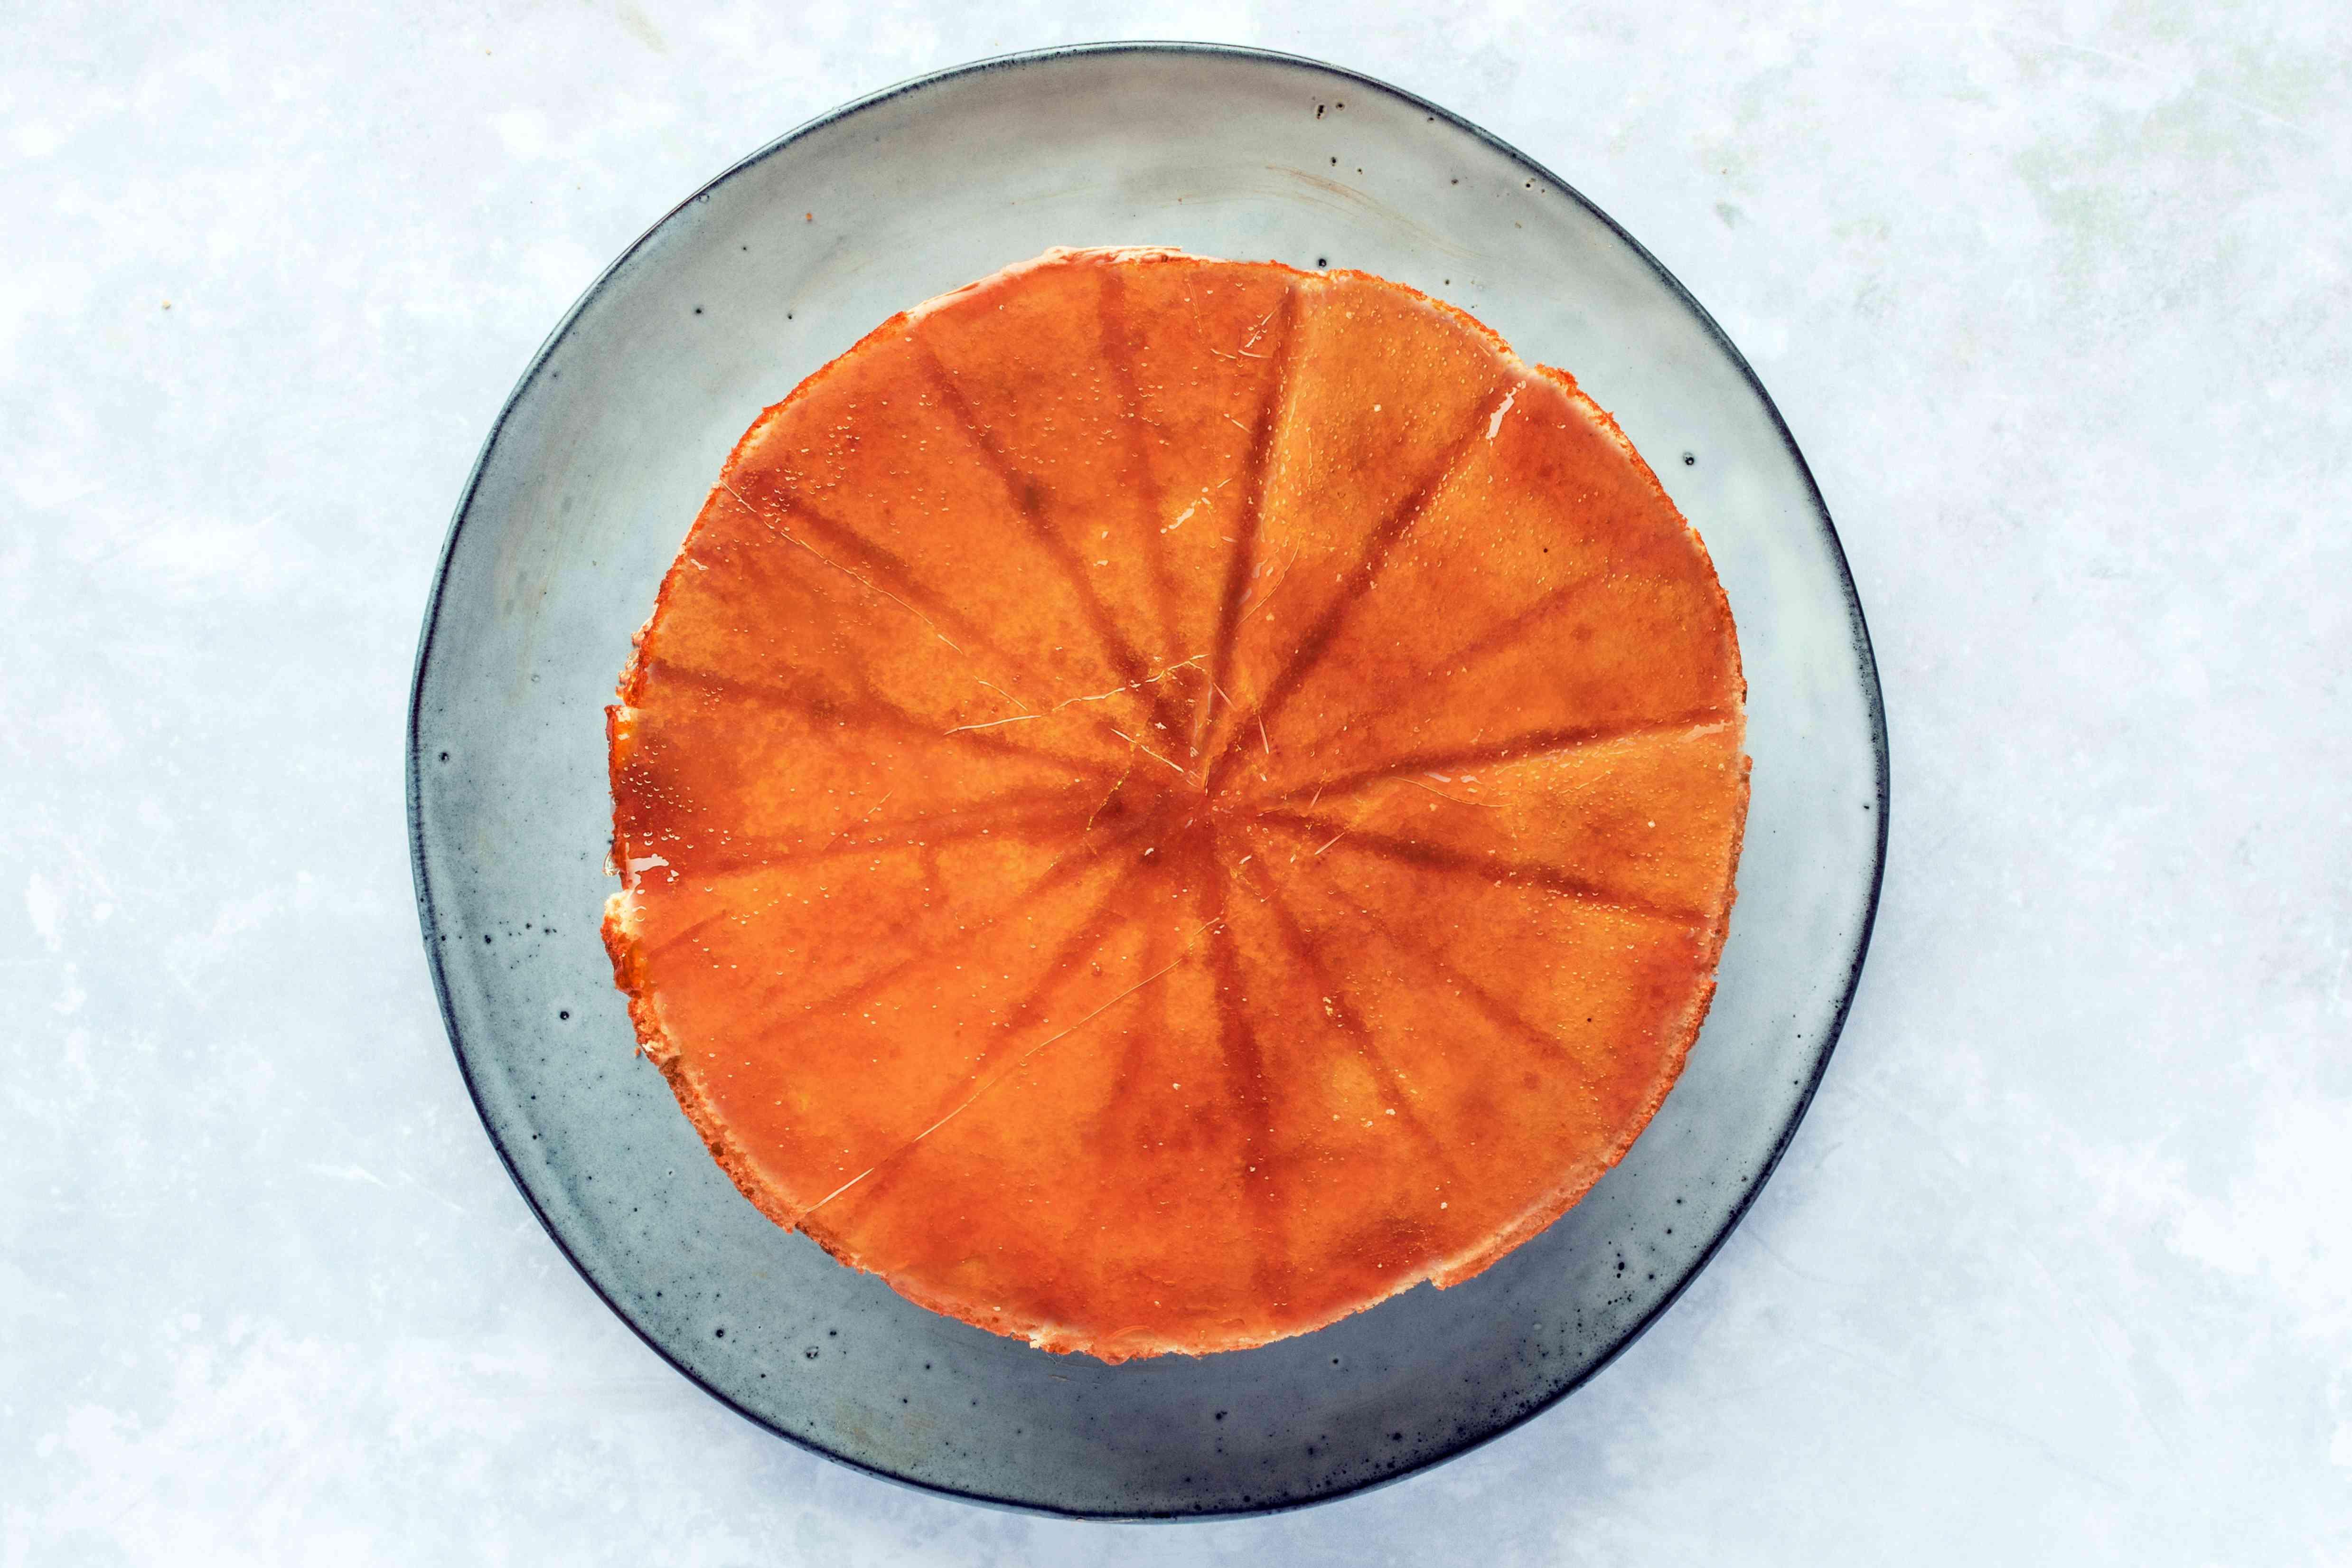 Assembled cake on a platter